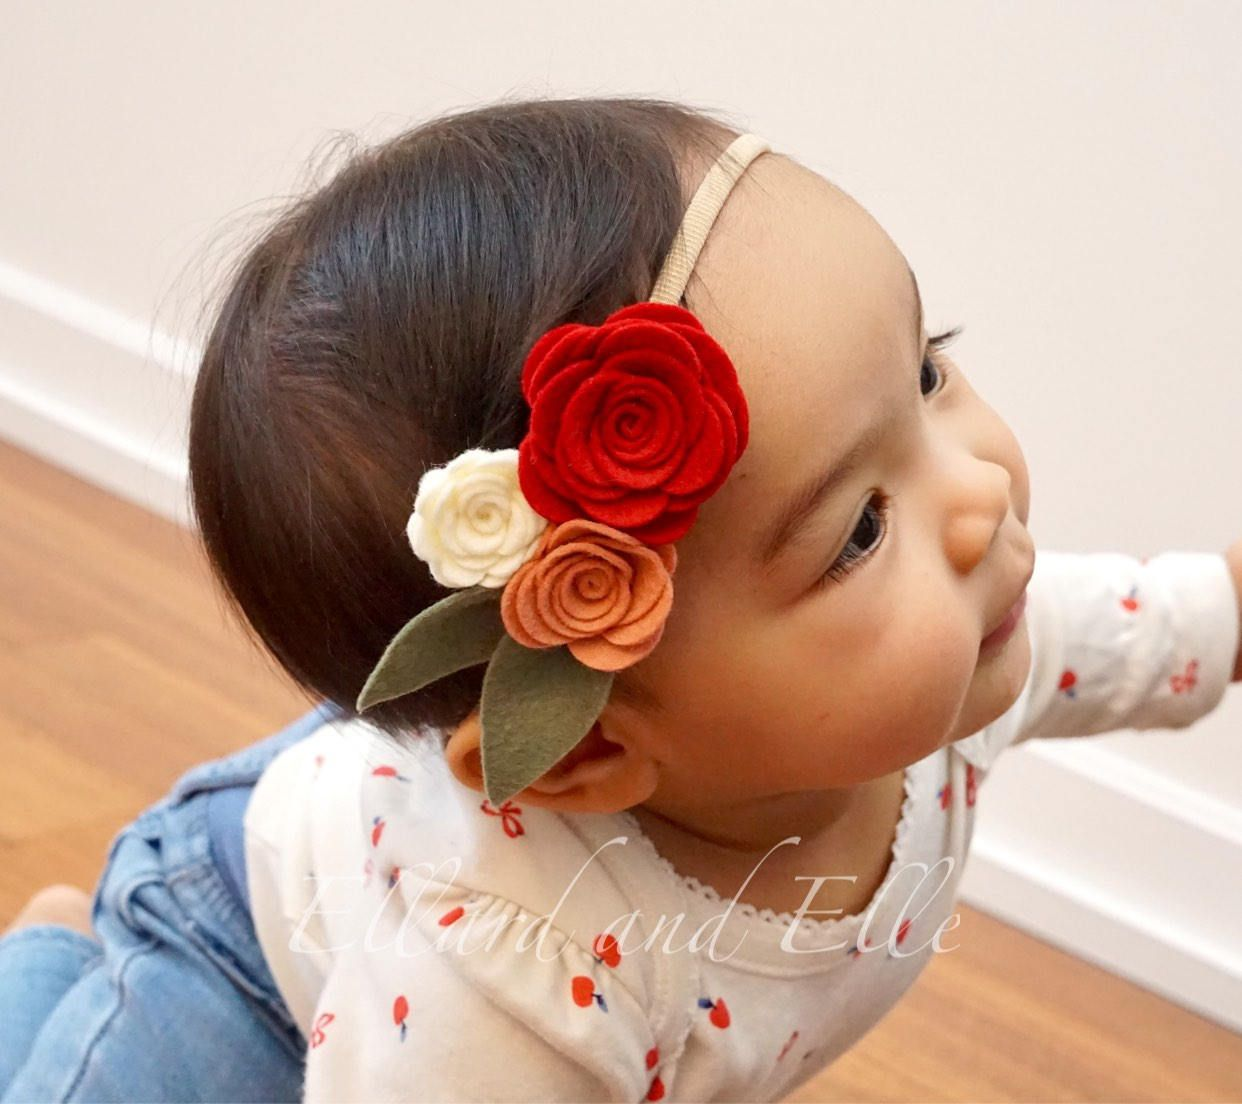 Purple 3 Rose Headband, Felt Flower Headband, Baby Flower Headband, Toddler Flower Headband, Girls Headband, Newborn Headband #feltflowerheadbands